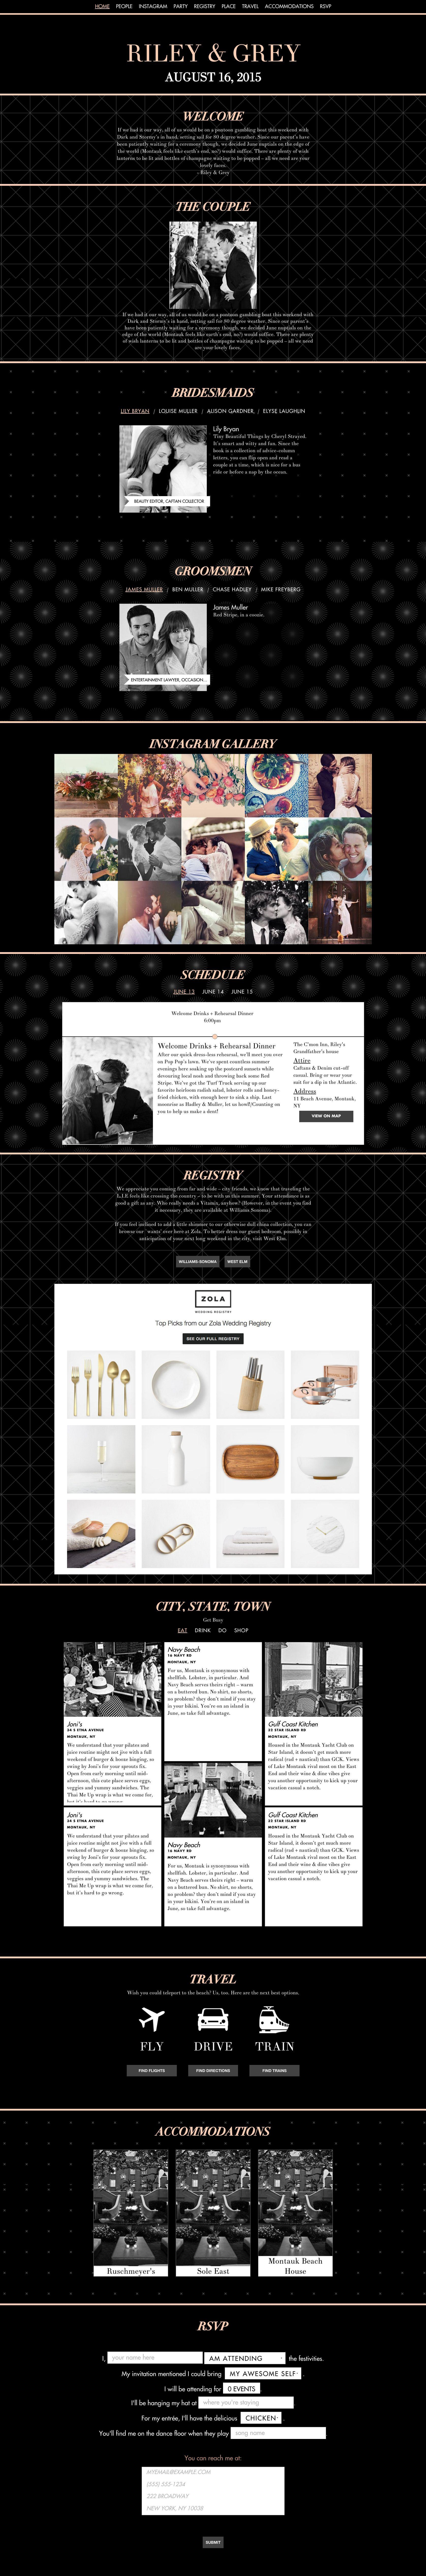 """Copper Tone"" black wedding website design by Riley & Grey"